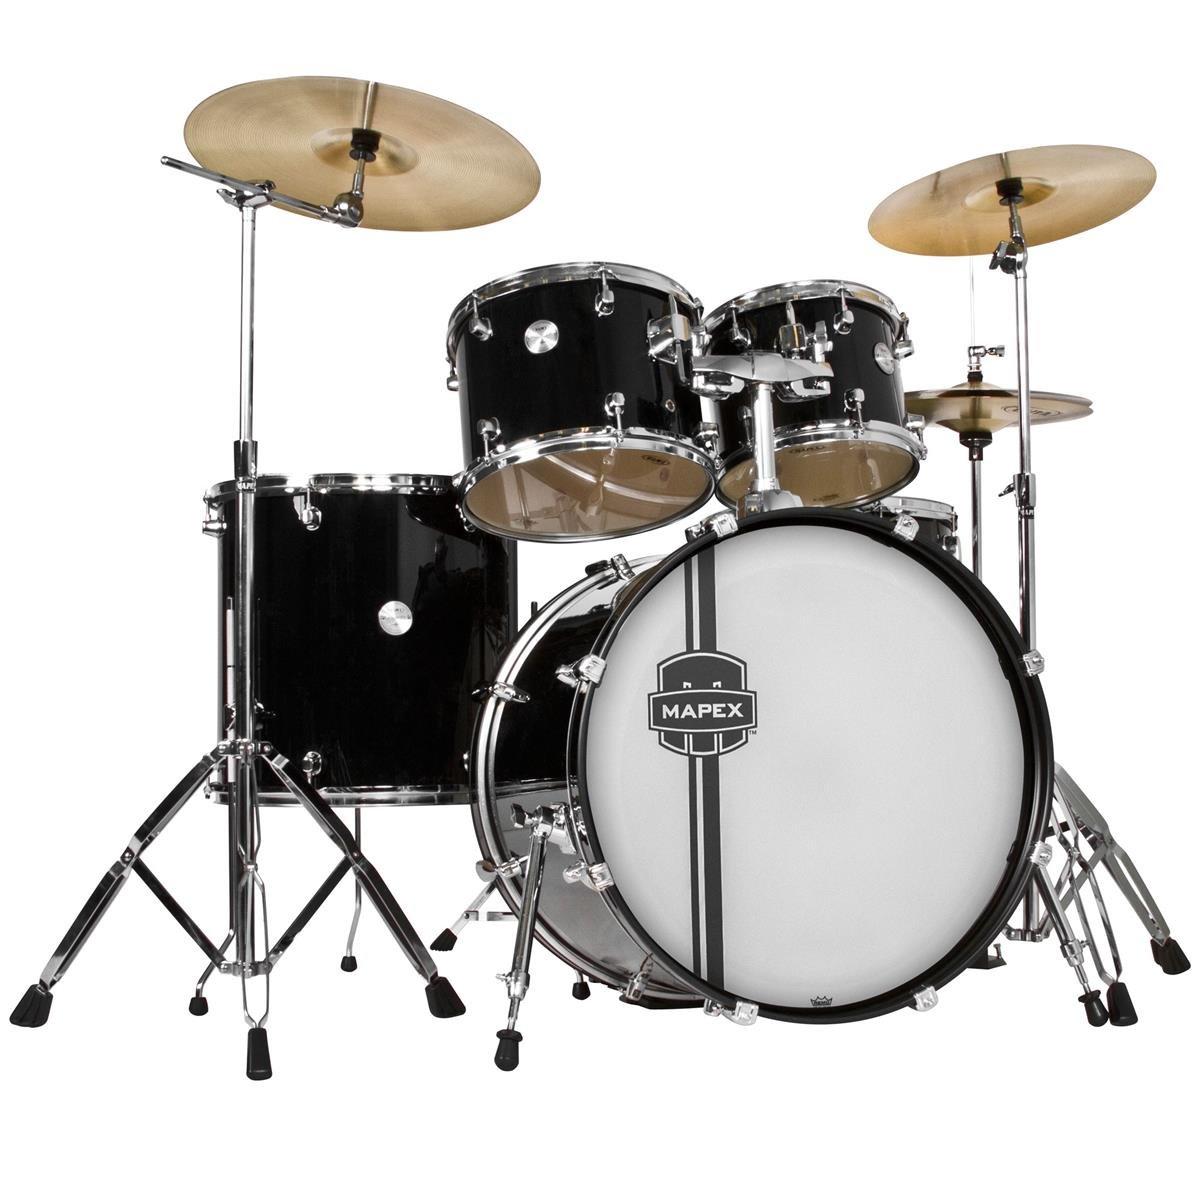 Black Cymbal Set Set With Cymbals Black